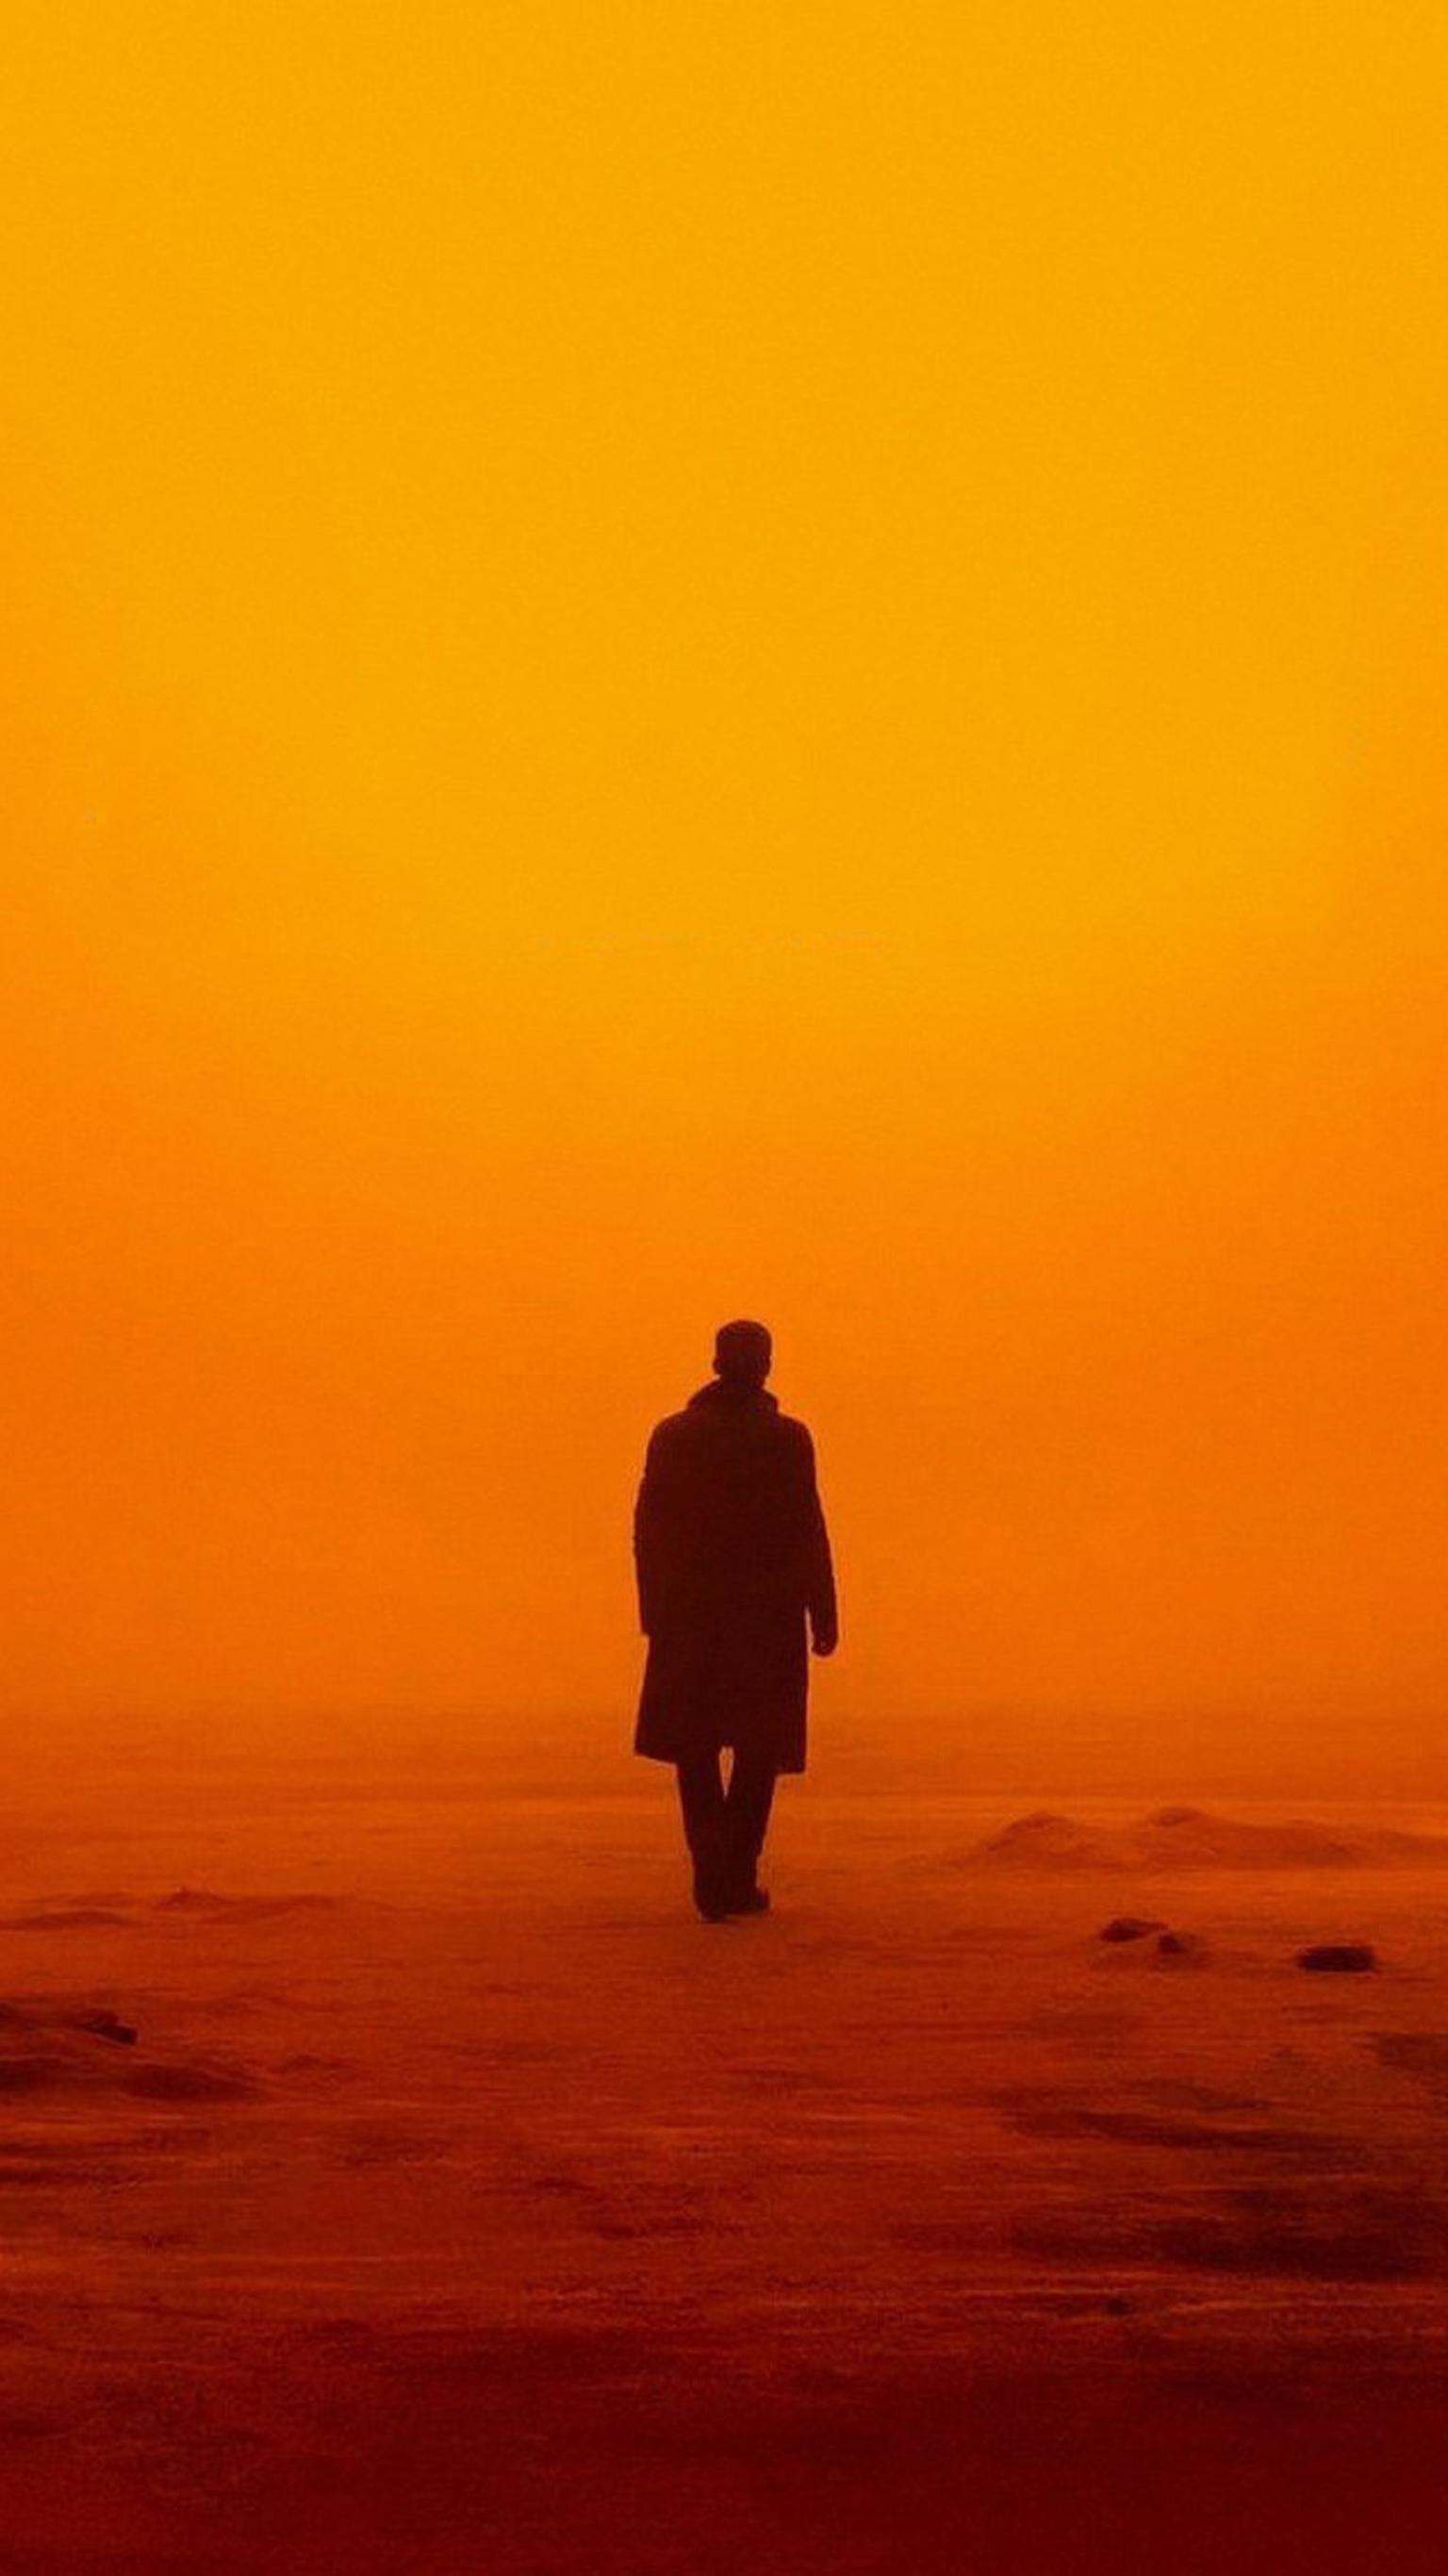 Blade Runner 2049 4k Wallpapers Top Free Blade Runner 2049 4k